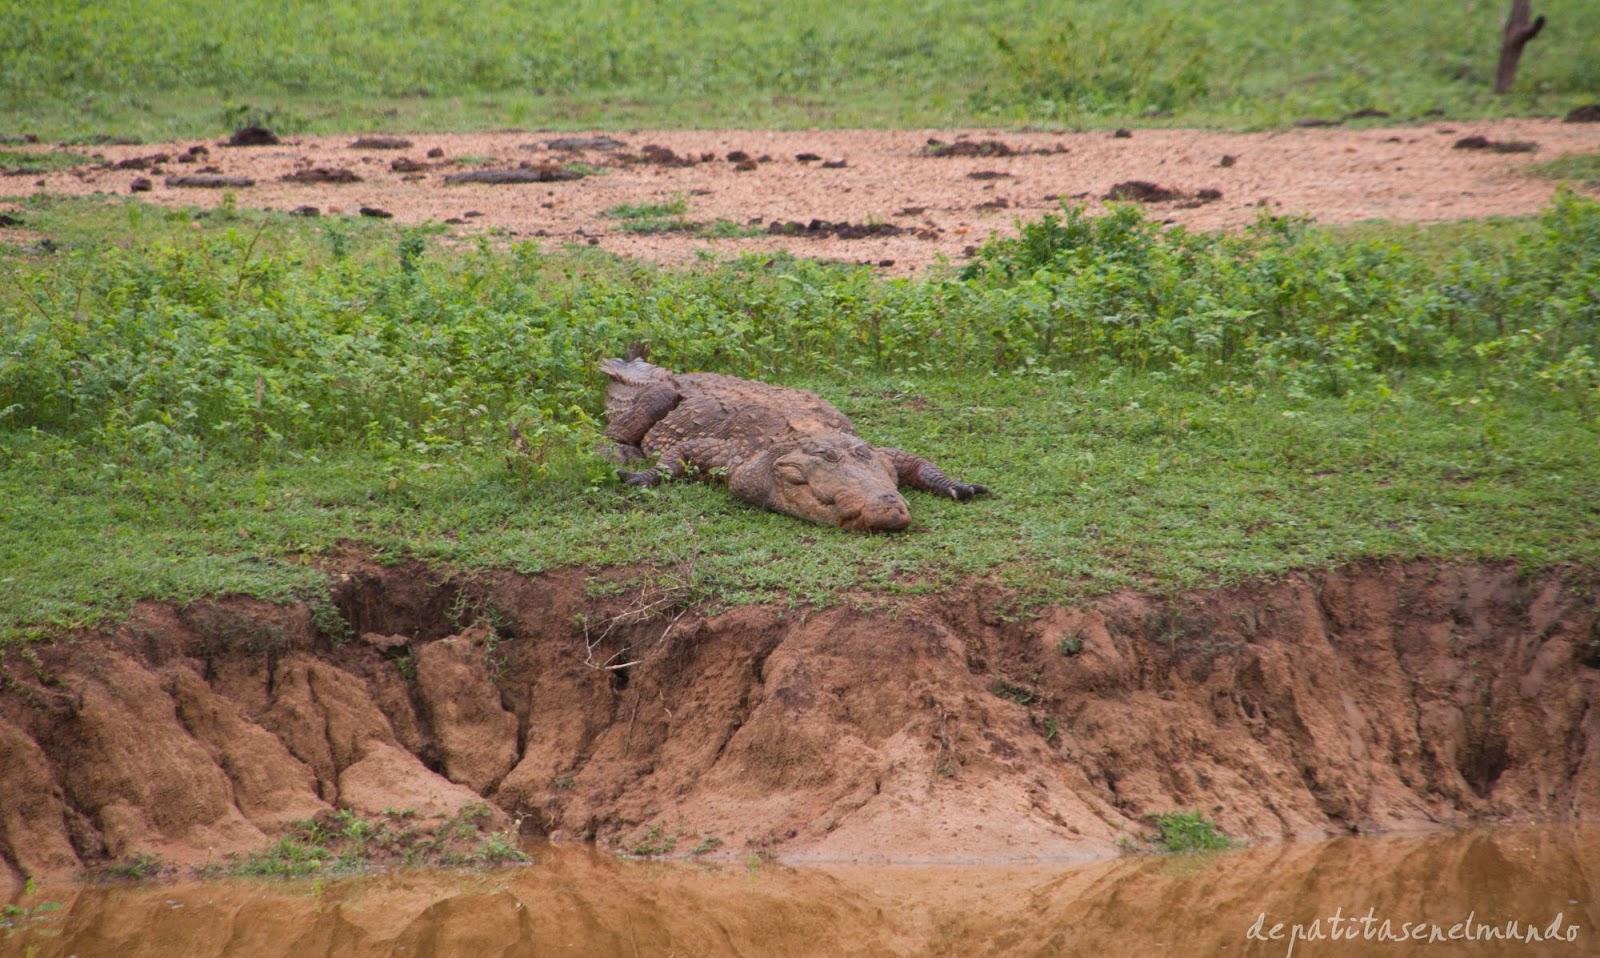 Pavo real y cocodrilo en Yala, Sri Lanka